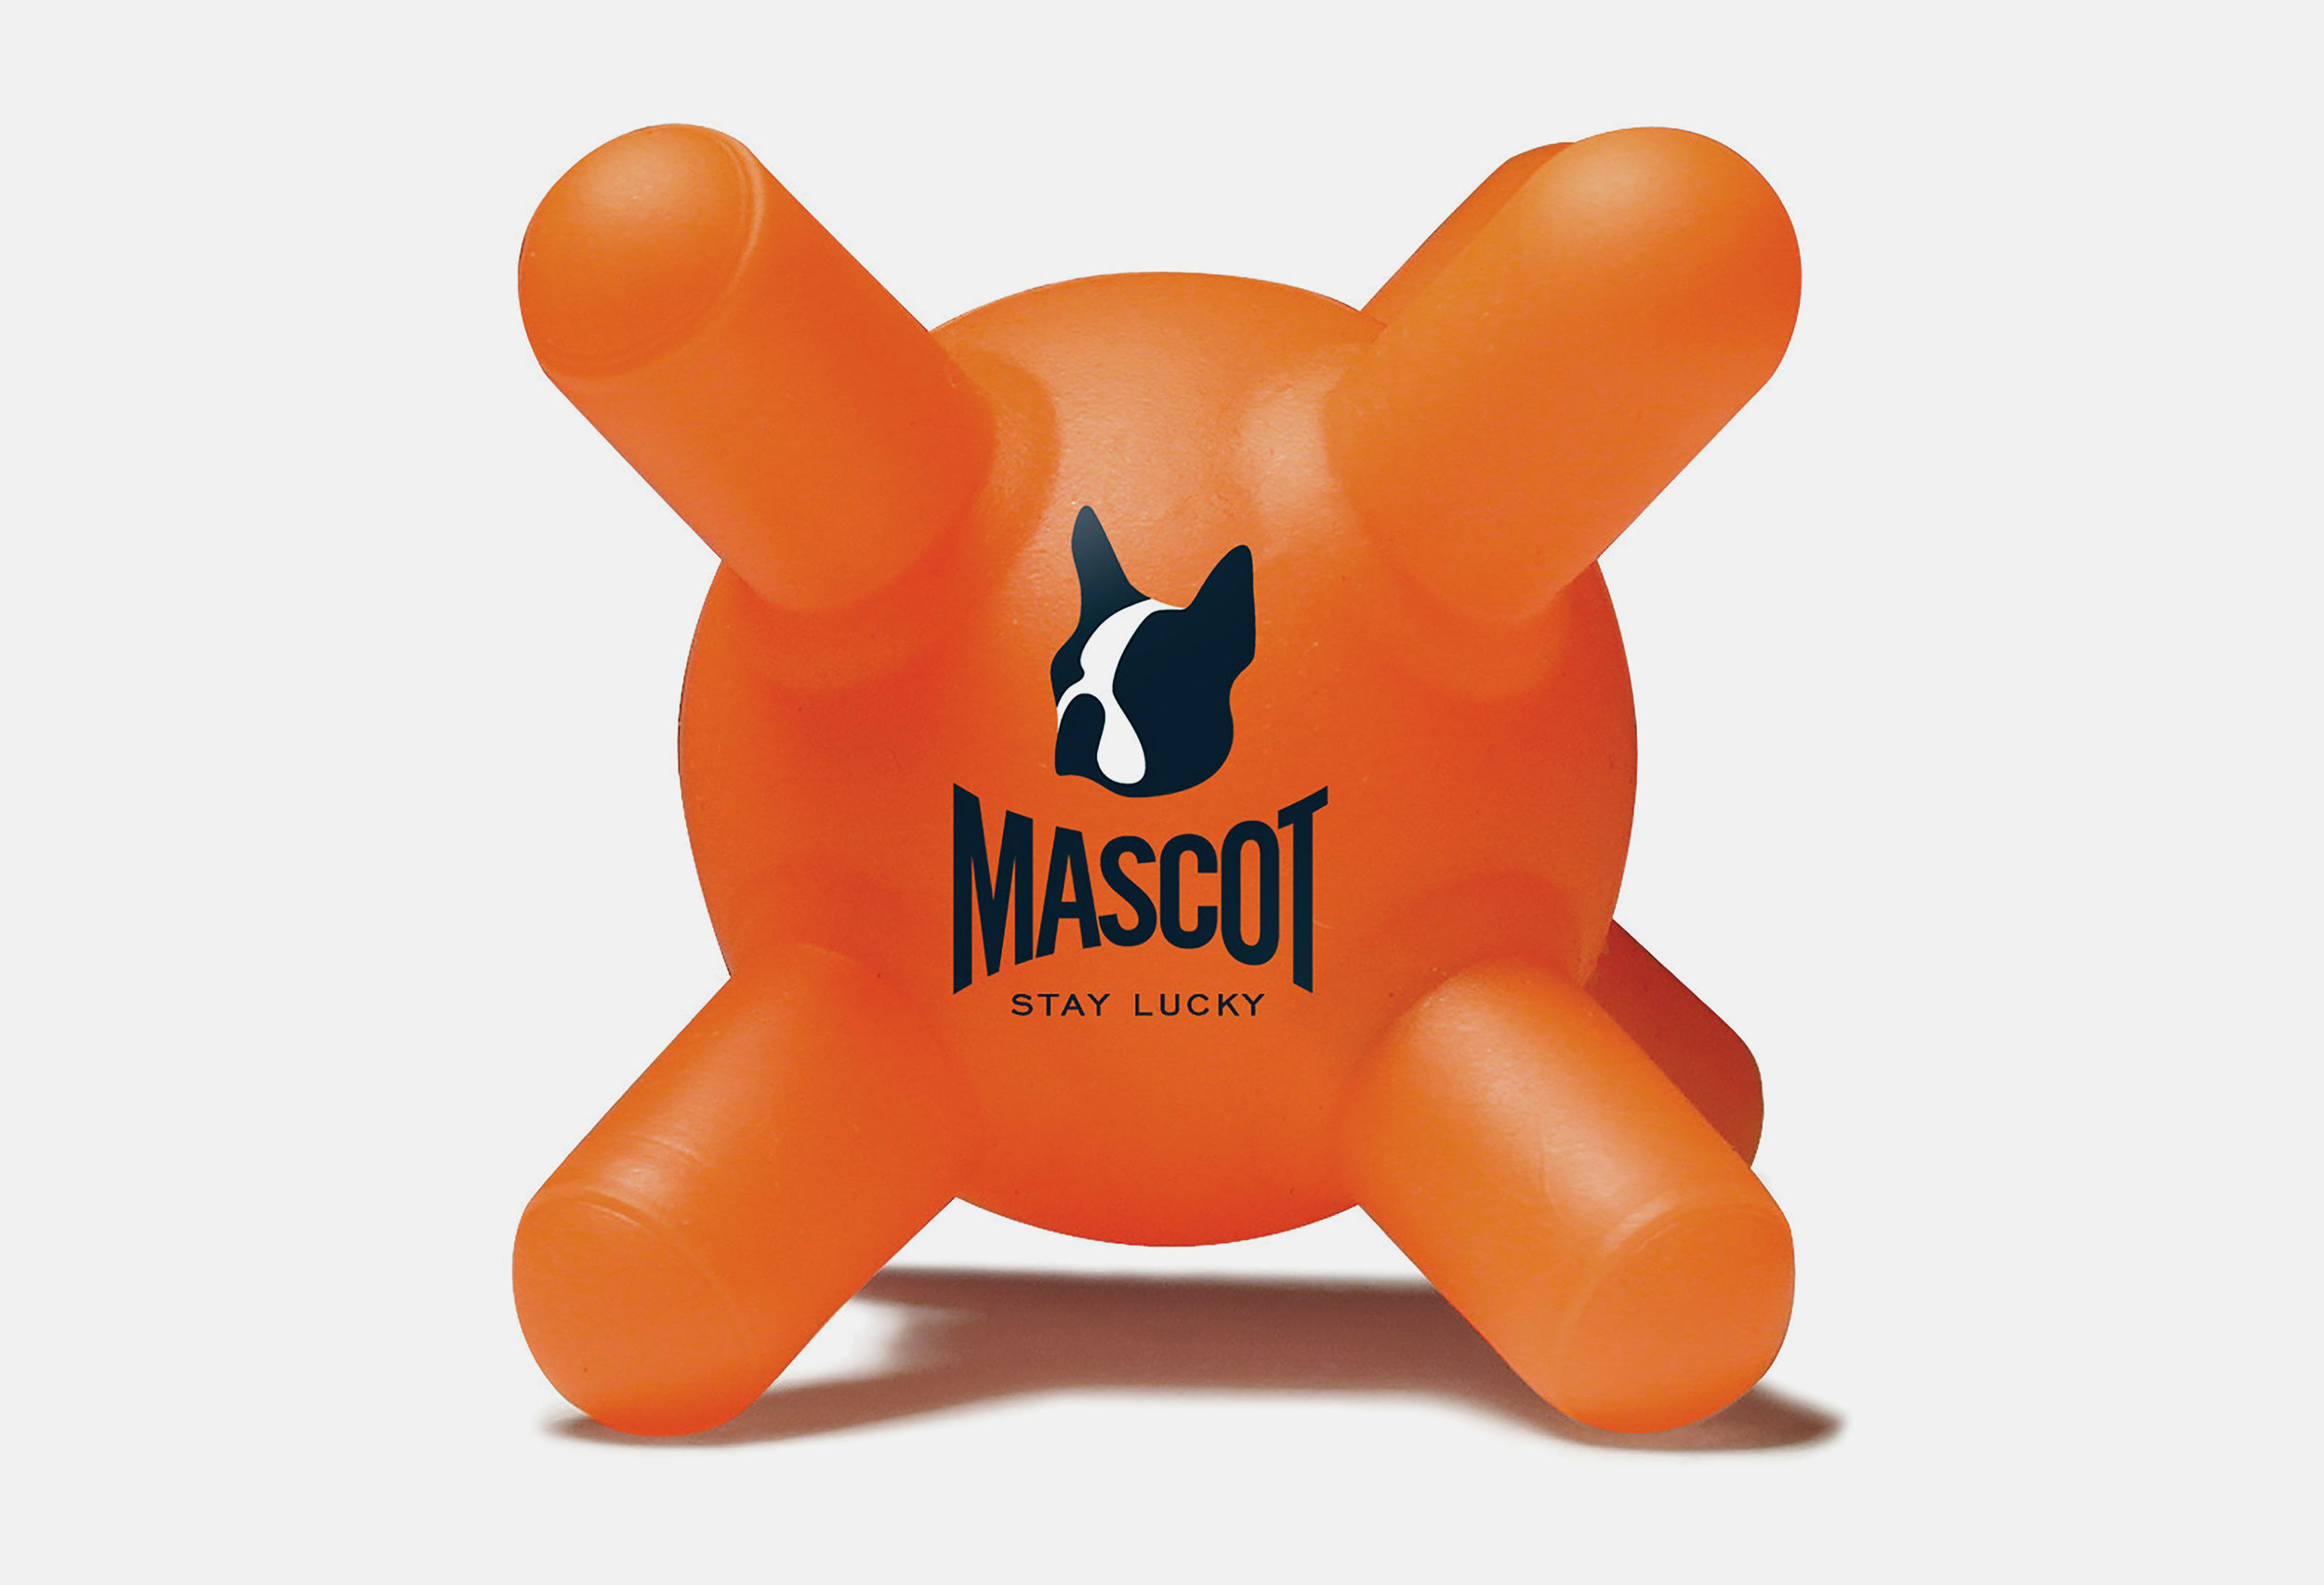 Mascot Images of Project orange.jpg